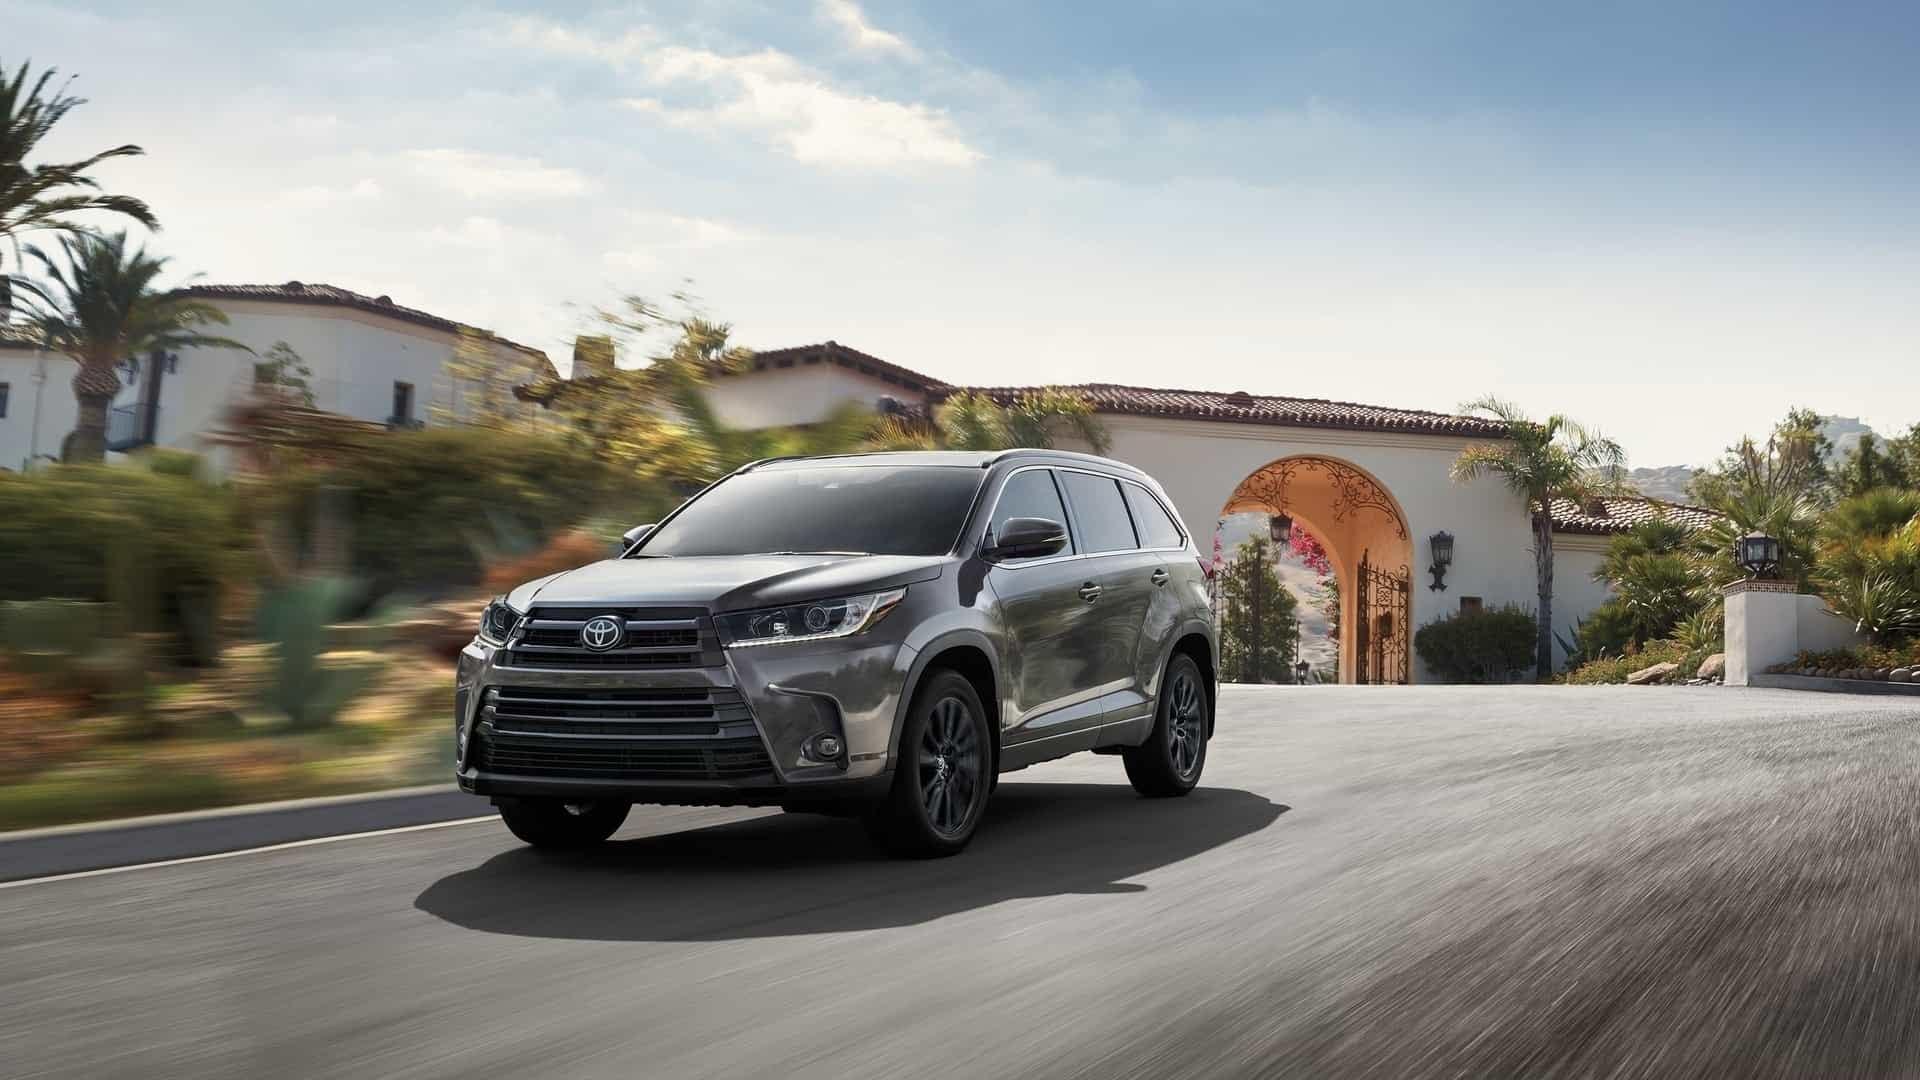 Lease a 2019 Toyota Highlander near Bossier City LA